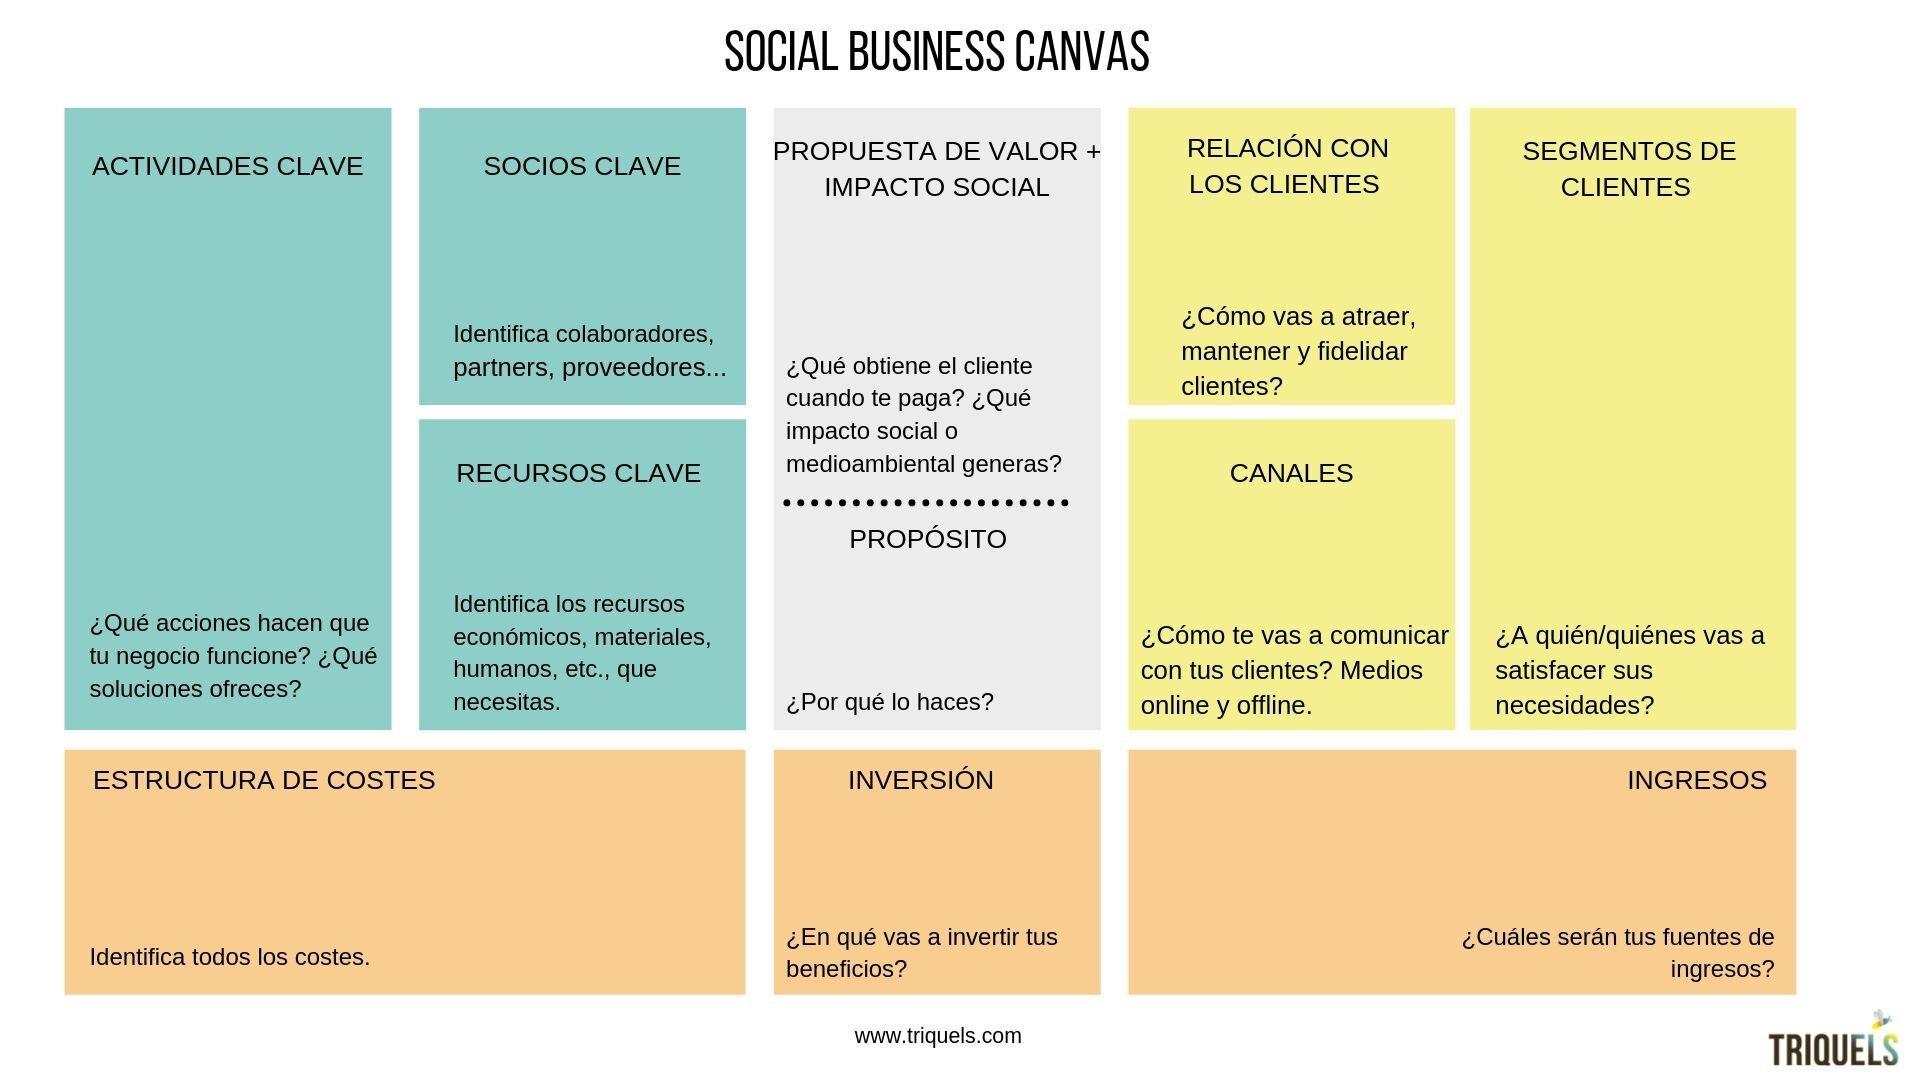 canvas_social.jpg